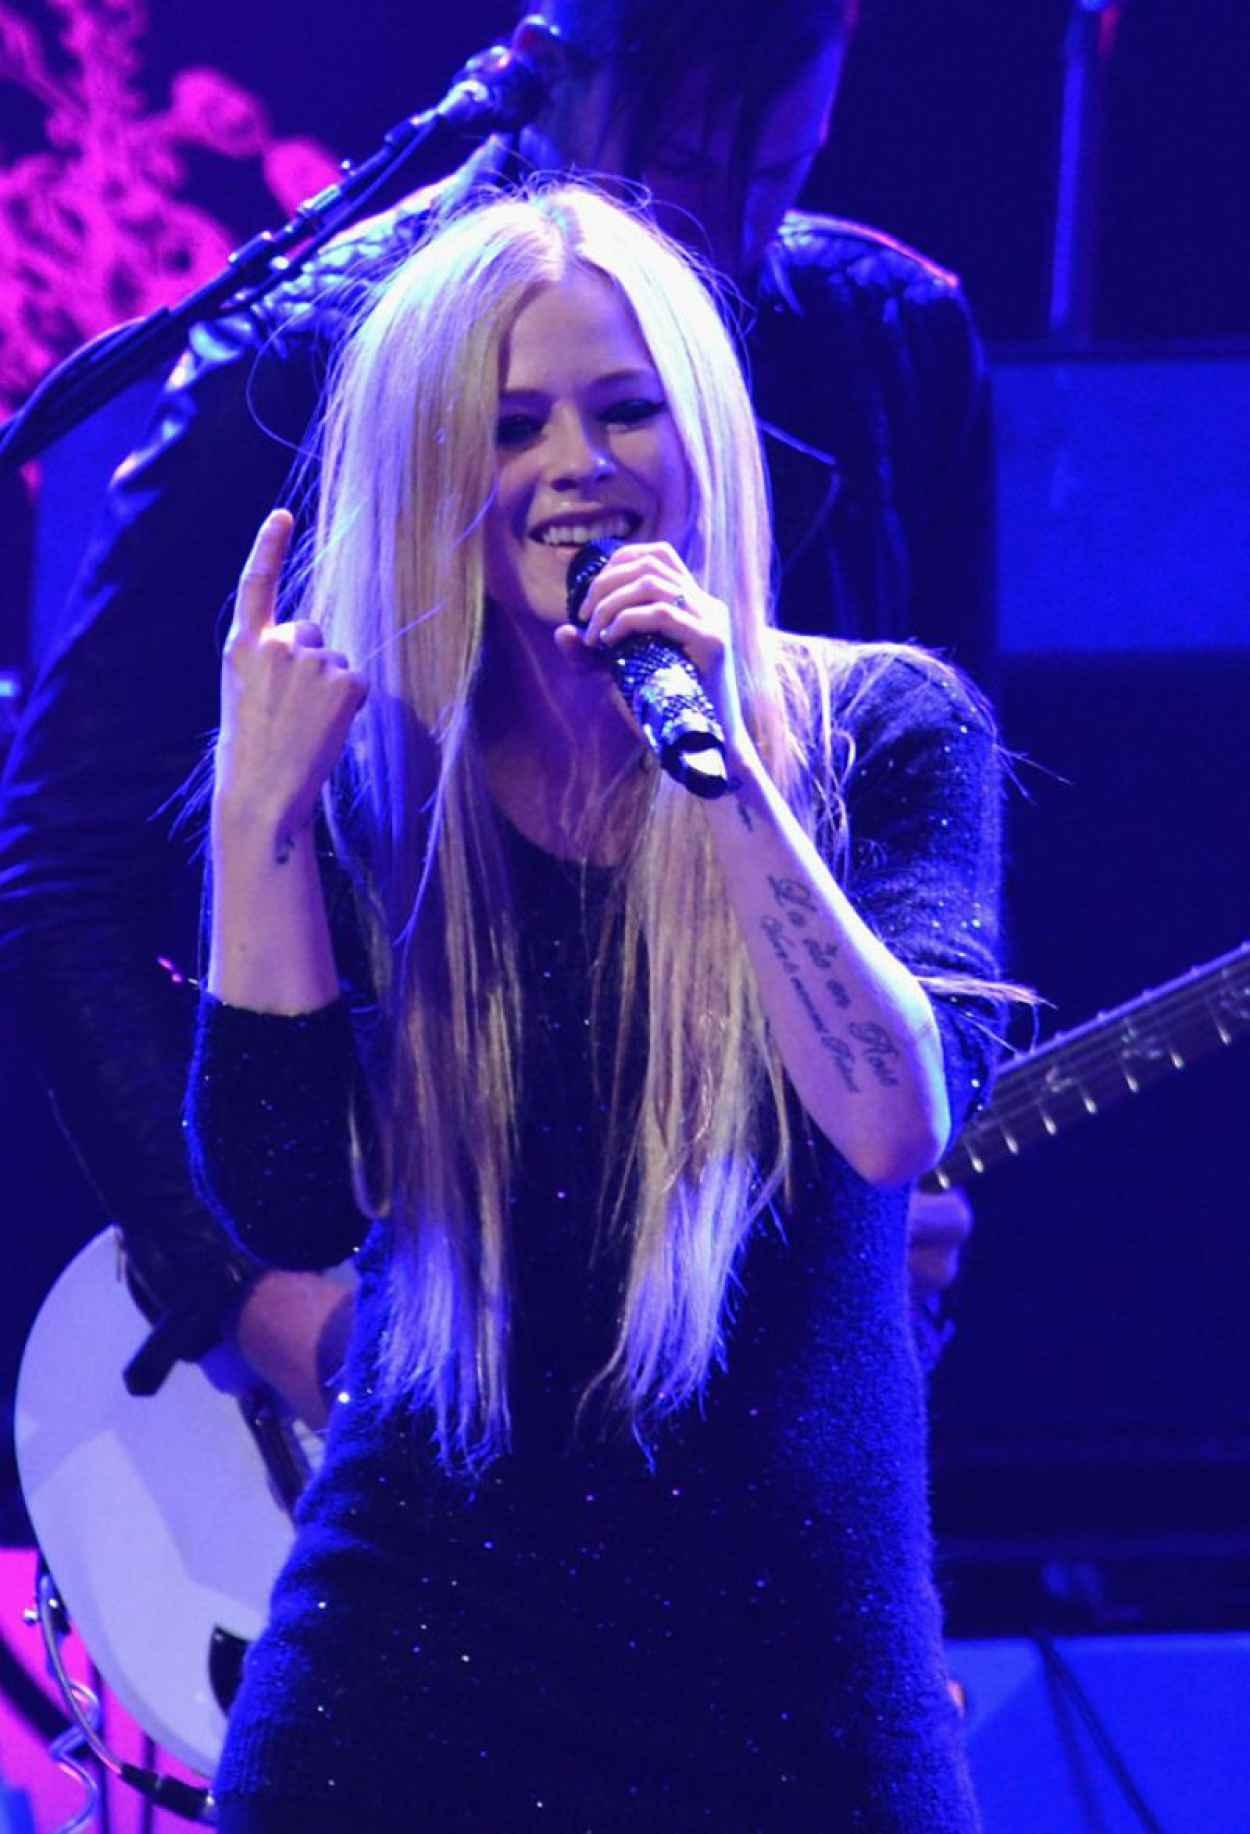 Avril Lavigne - 103.5 KISS FMs Jingle Ball in Chicago - December 2015-1